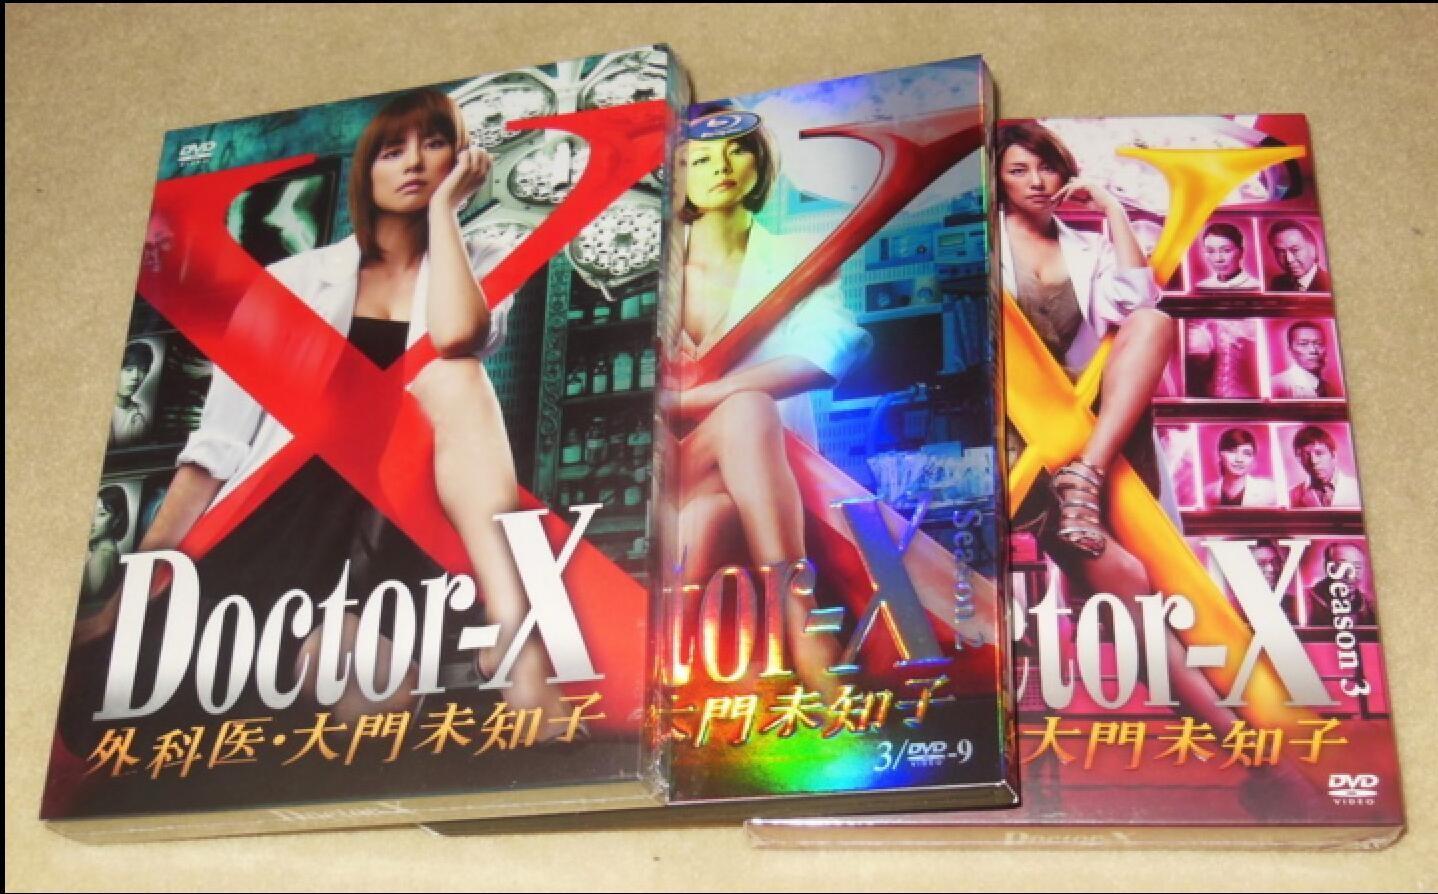 Doctor-X 外科医·大門未知子  DVD